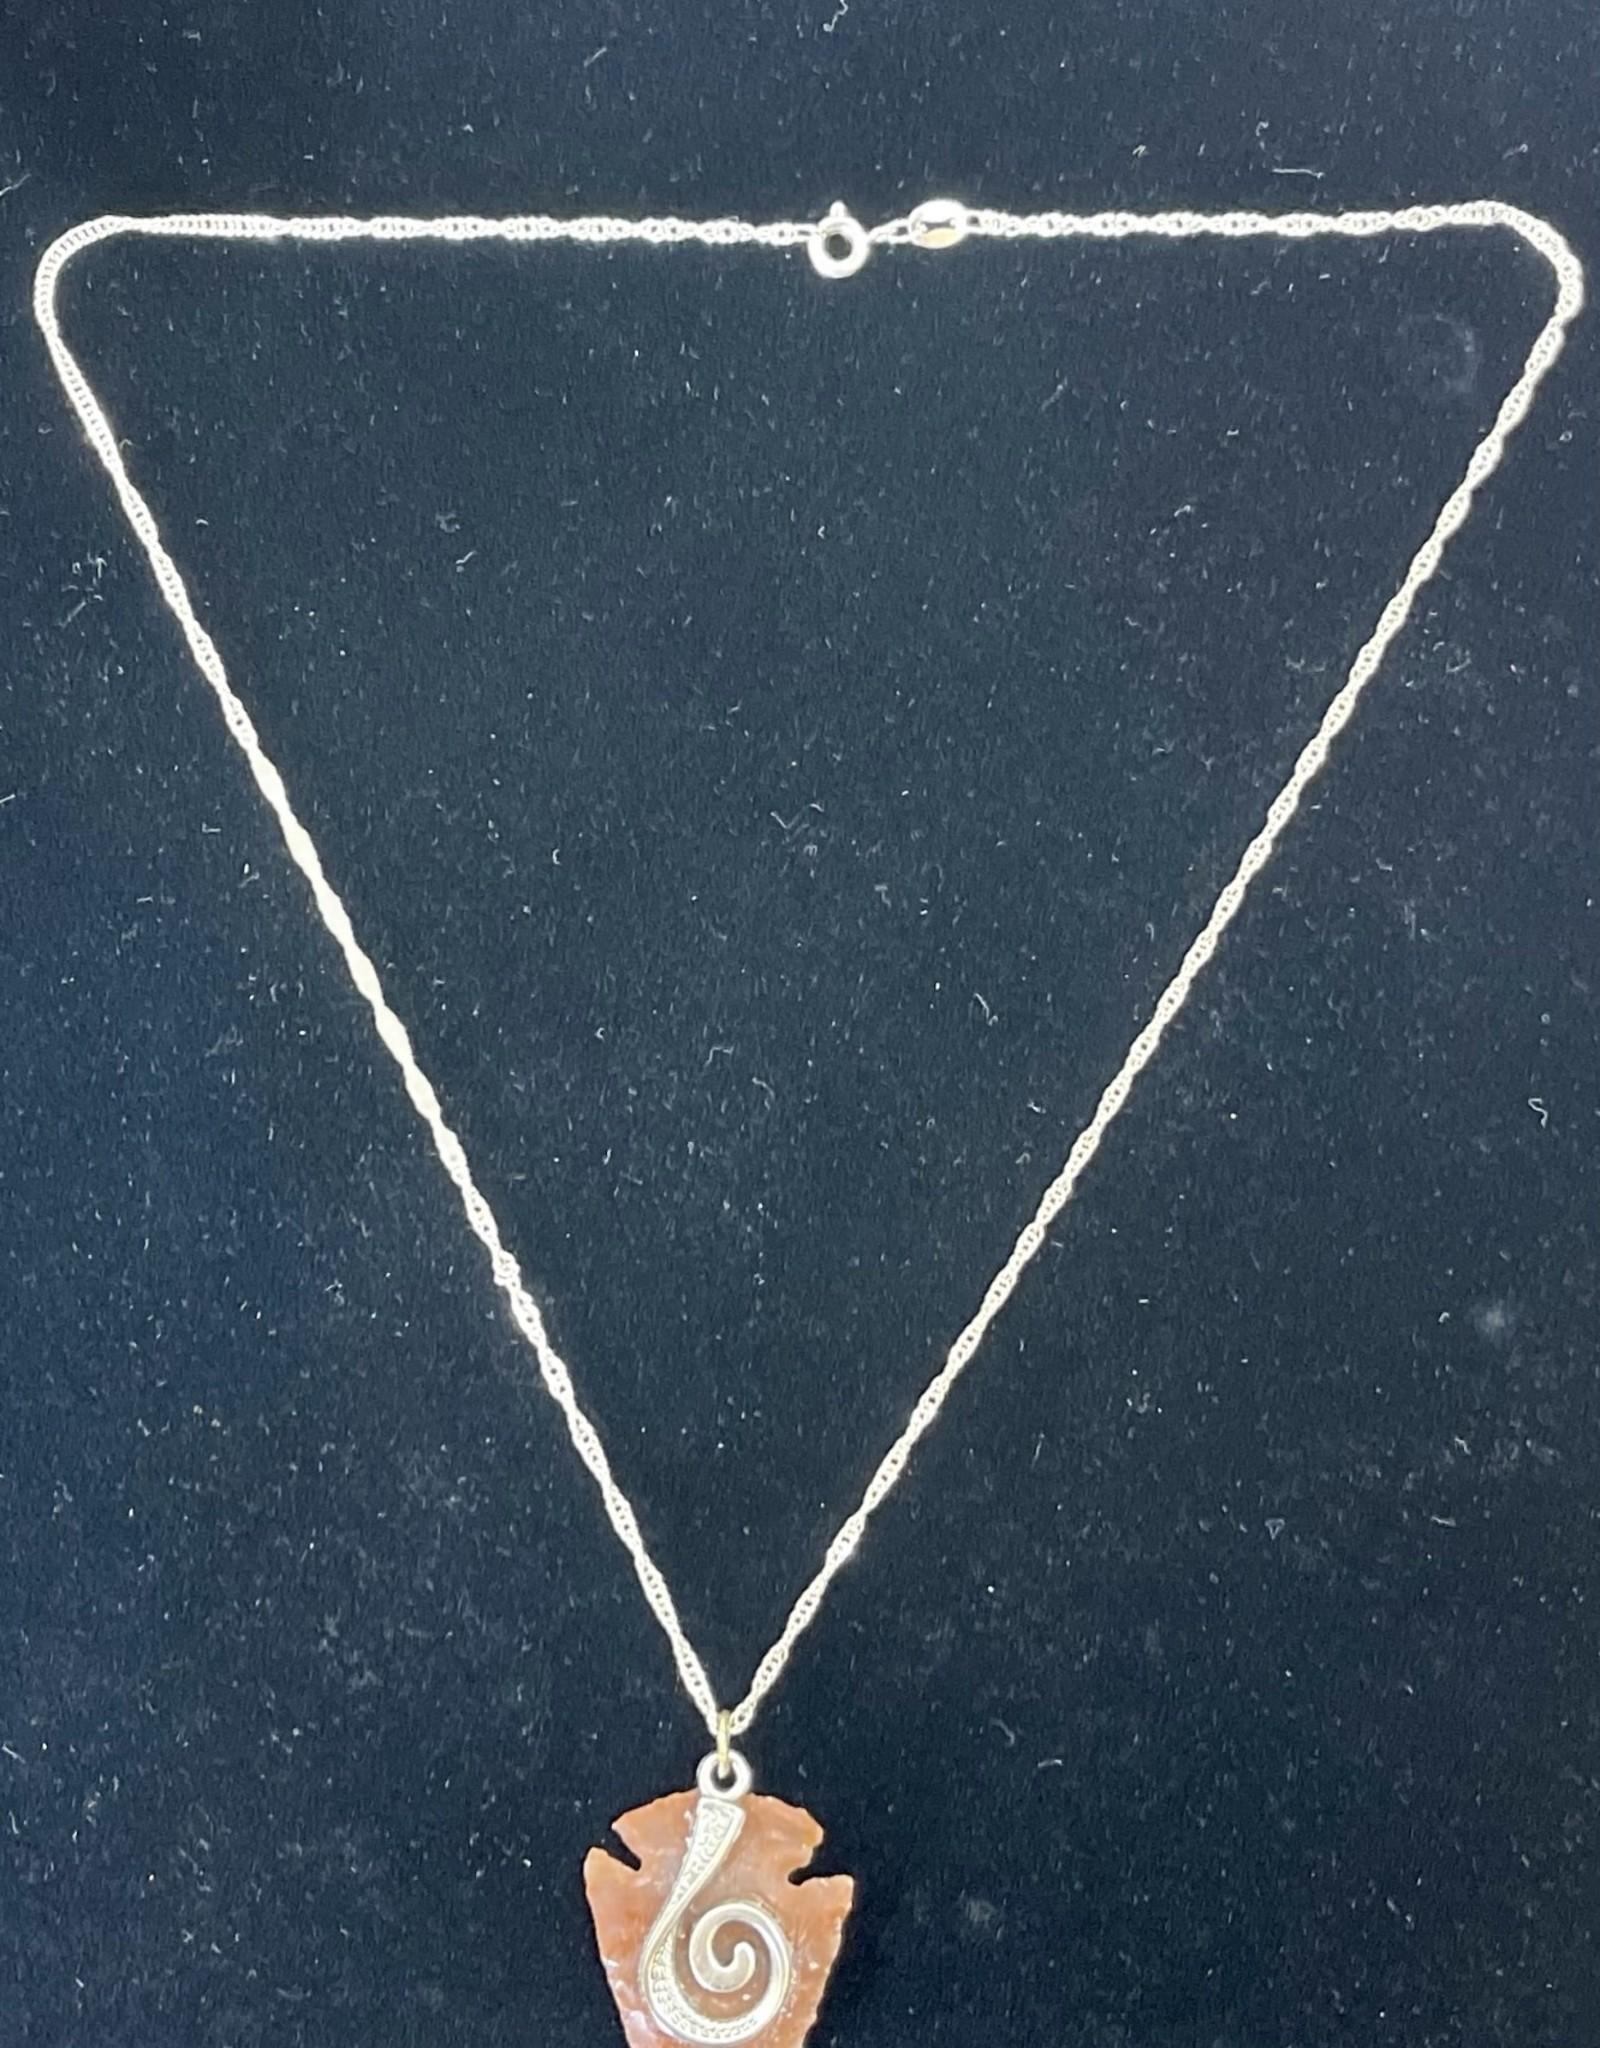 Jewelry - Arrowhead pendent